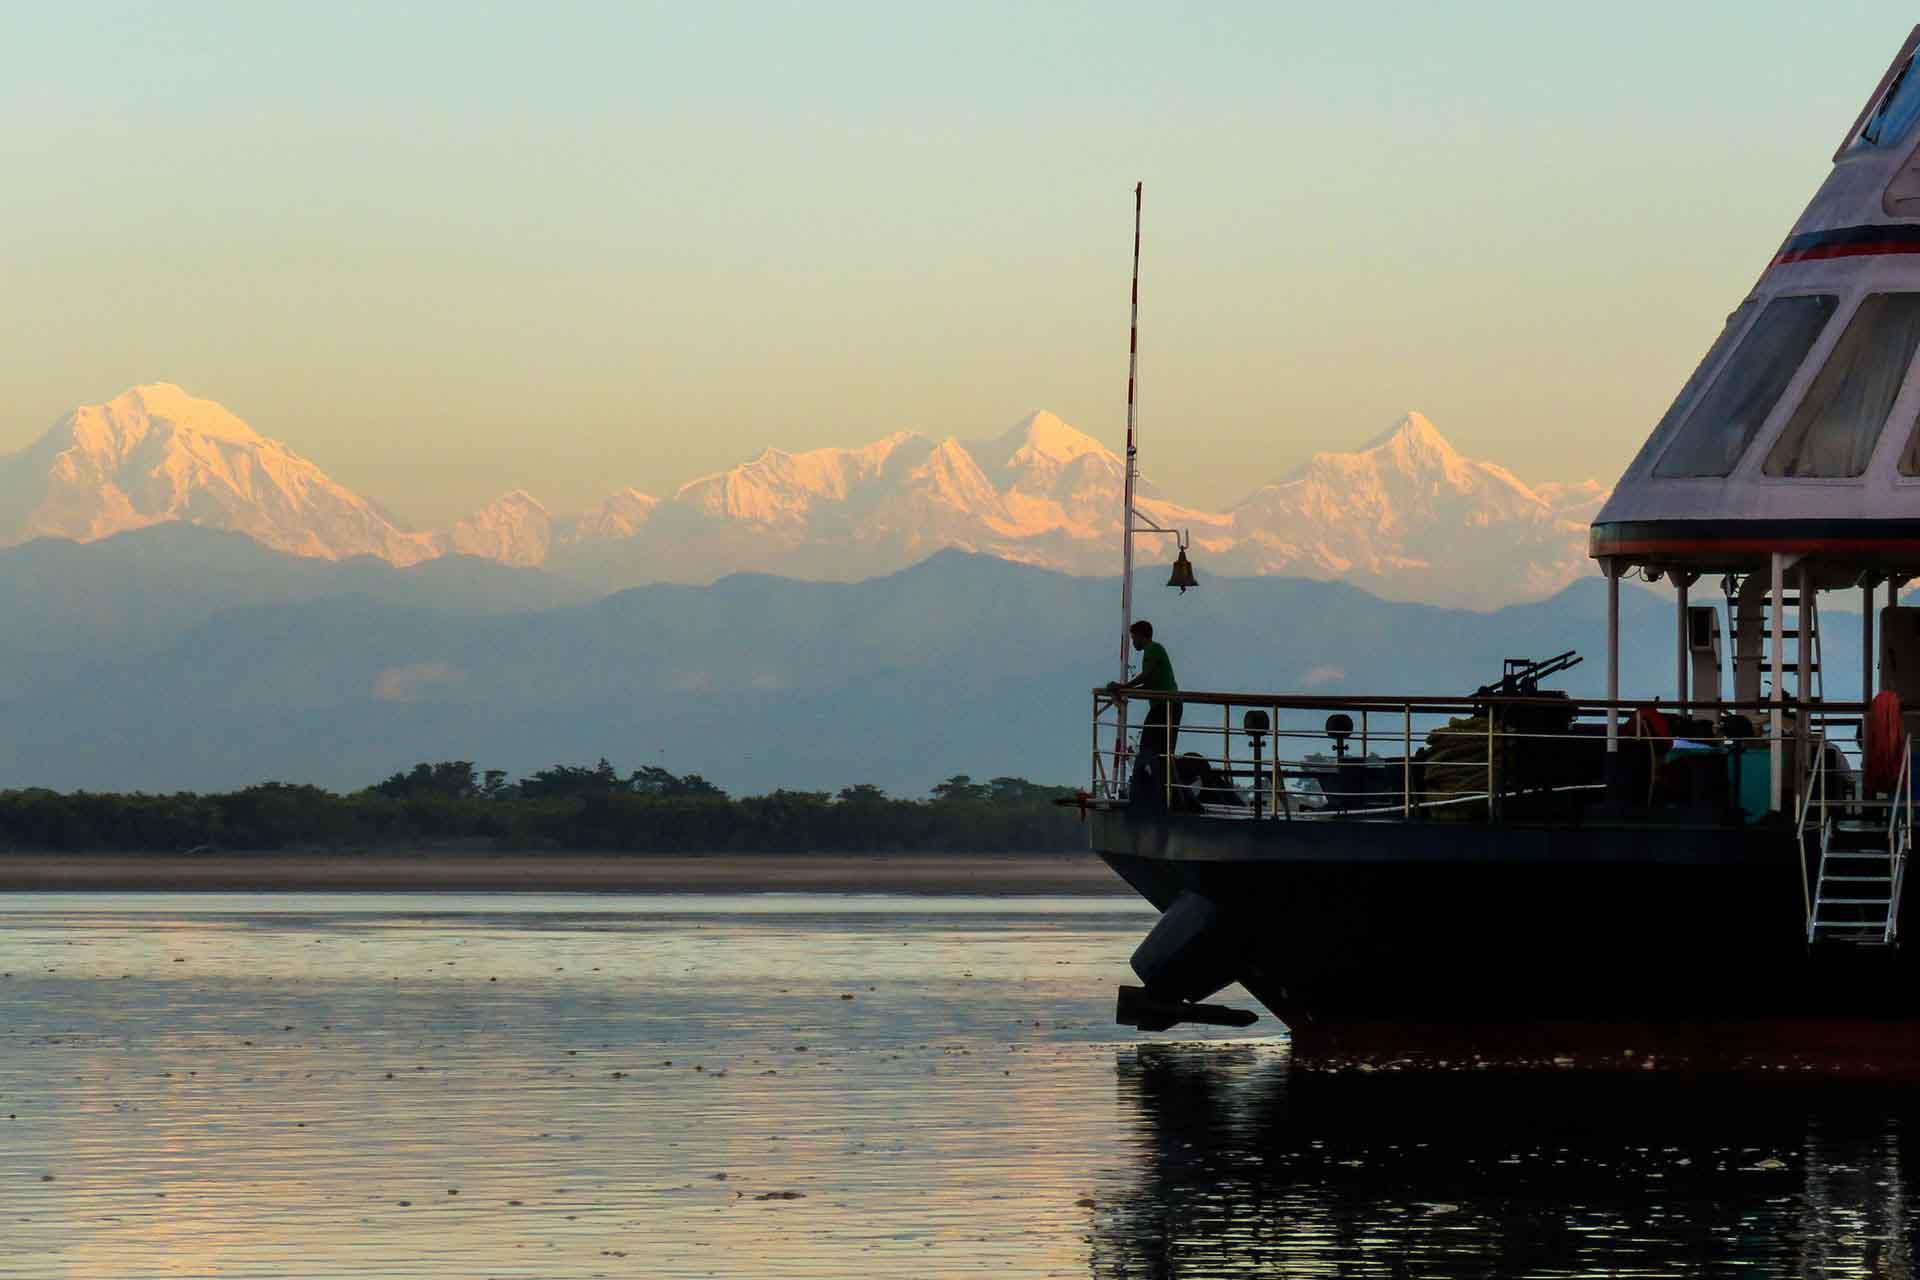 Himalayan Range View From MV Mahabaahu Cruise Assam